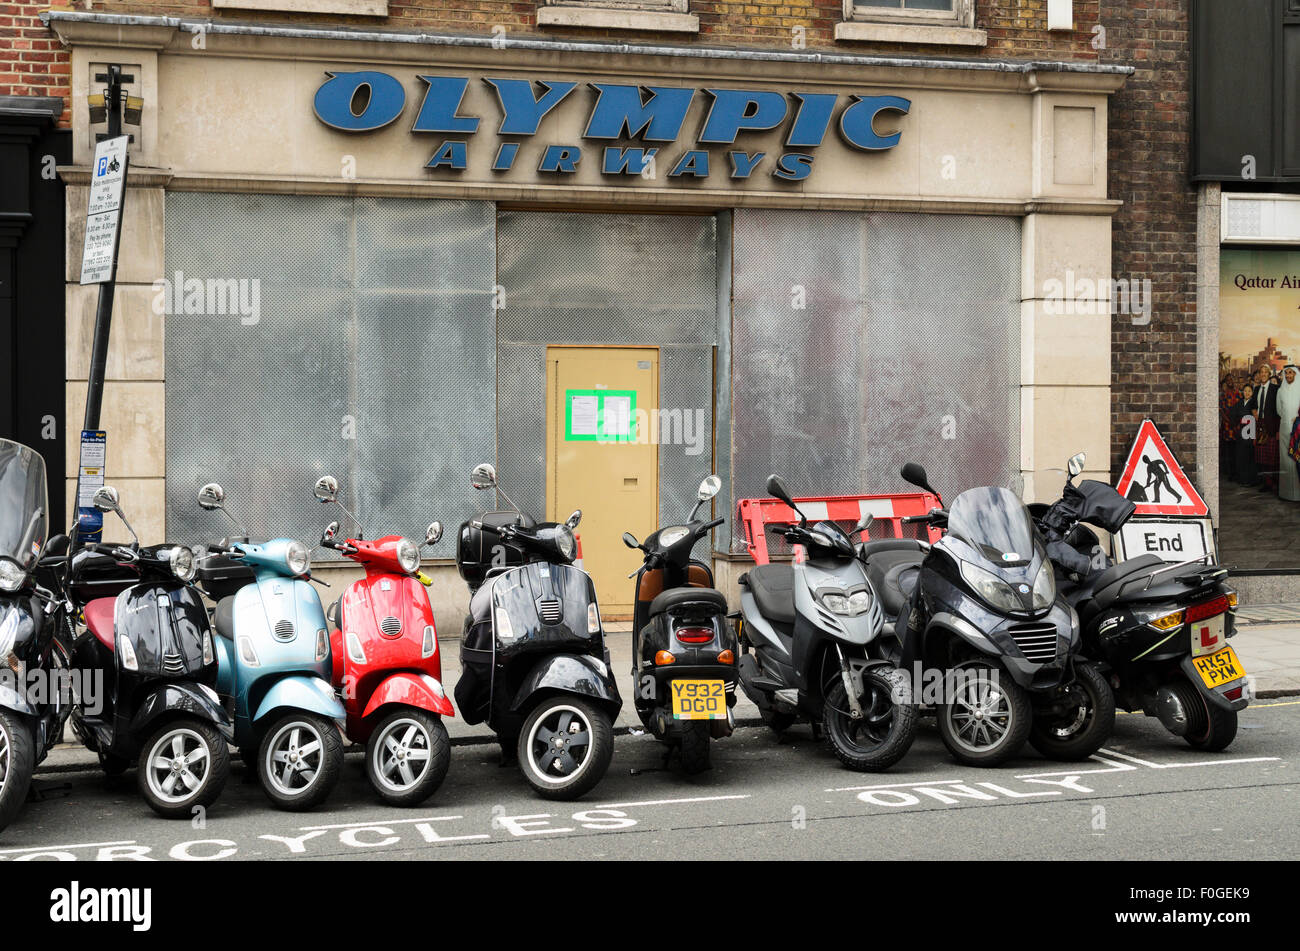 Mopeds geparkt außerhalb der ehemaligen Olympic Airways Büro, London, England, UK. Stockfoto